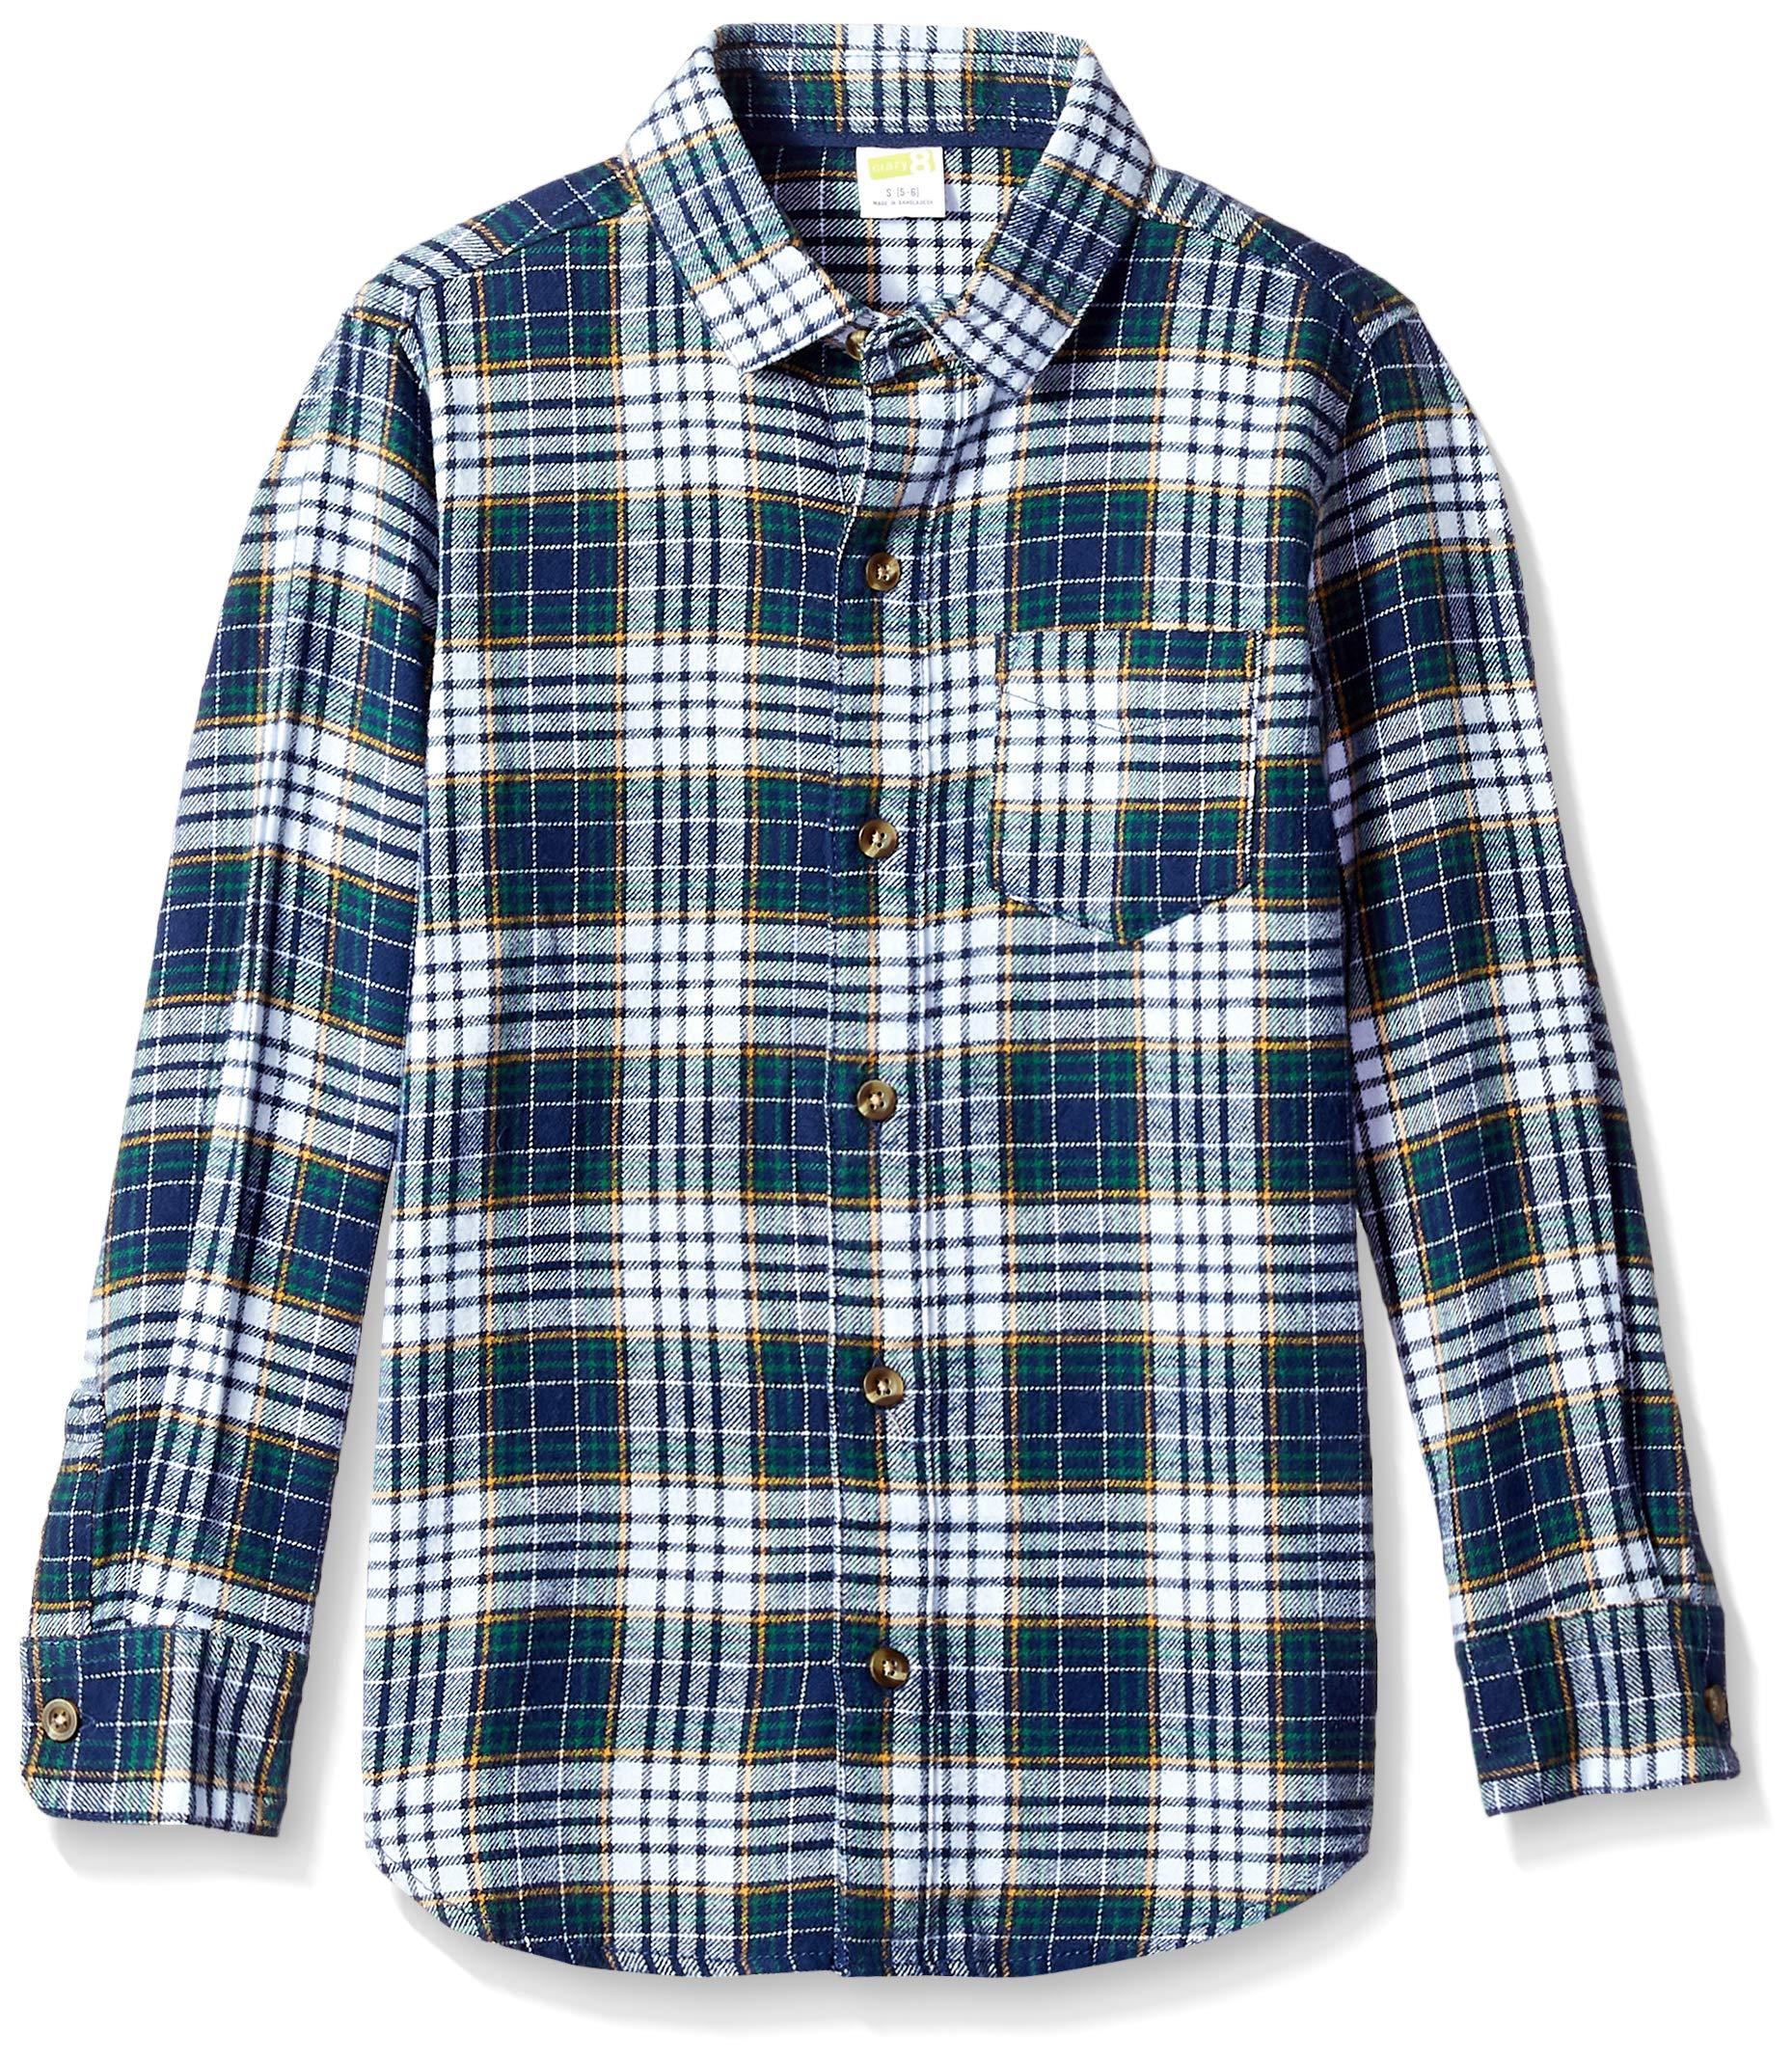 Crazy 8 Boys' Big Long Sleeve Pocket Button Up Shirt, Blue Plaid, L by Crazy 8 (Image #1)